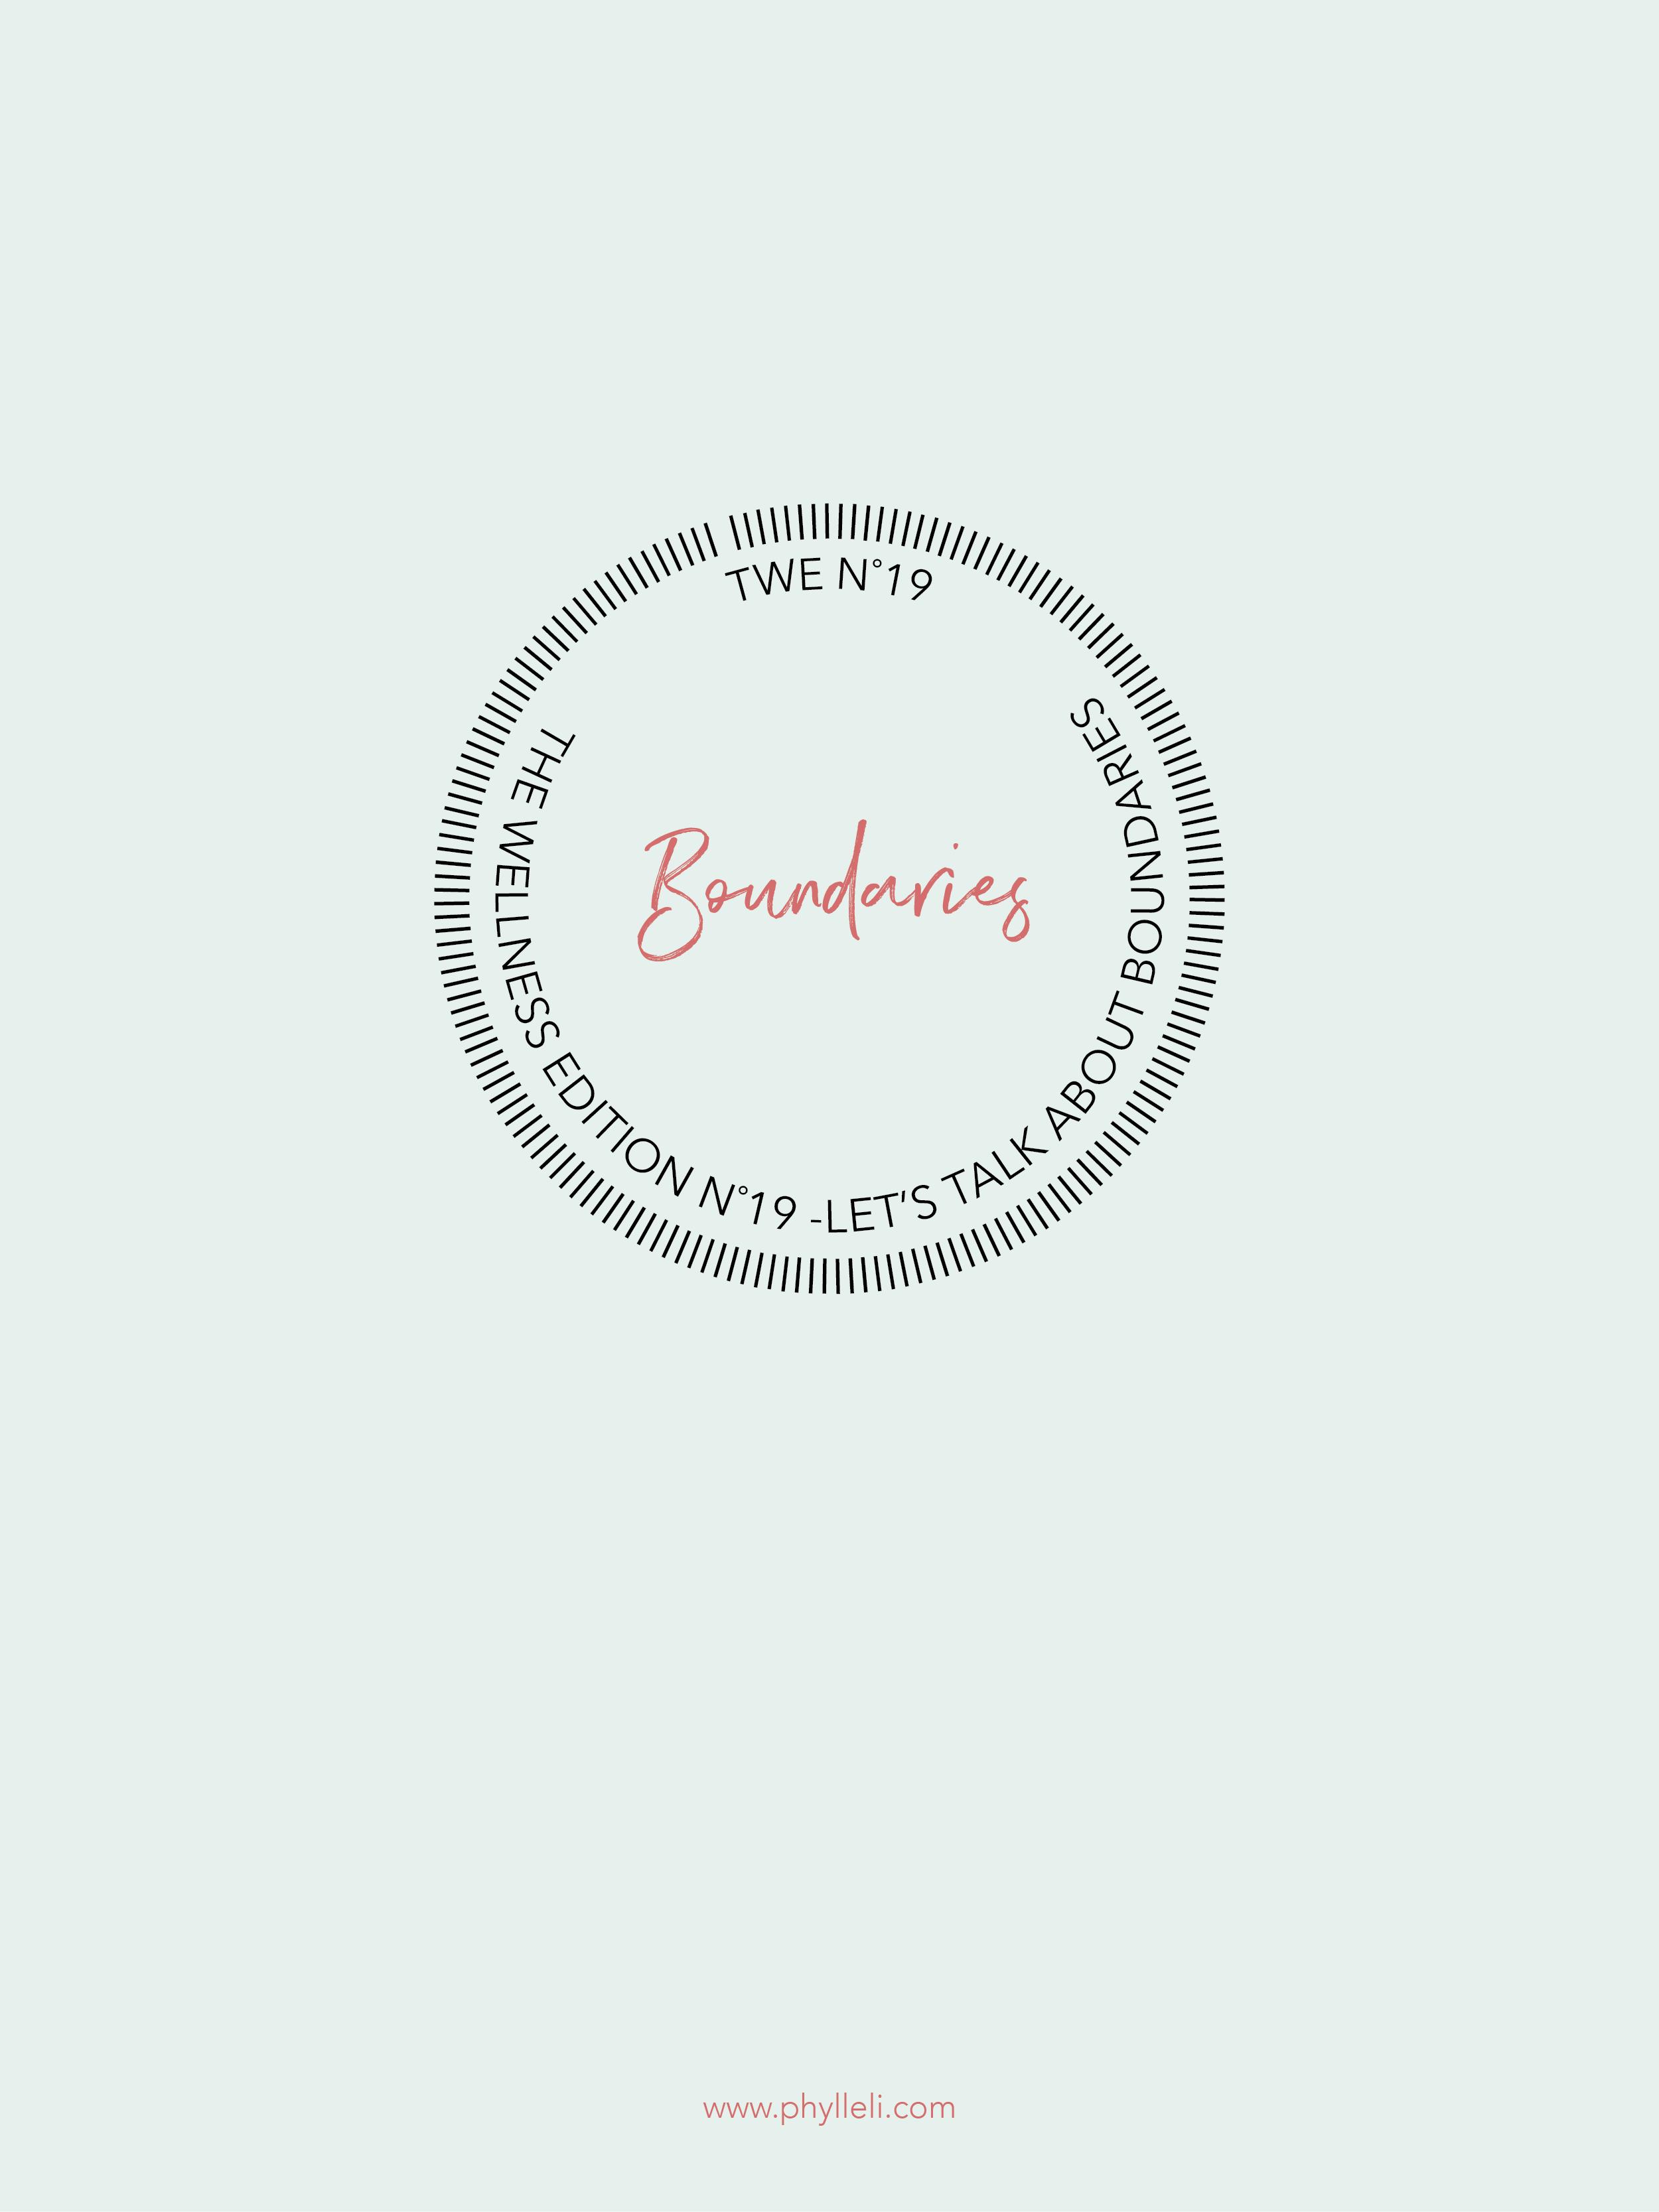 #thewellnessedition #twe #phylleli #logodesign #logo #branding #branddesigner #graphicdesign #graphicdesigner #freelancedesigner #minimalism